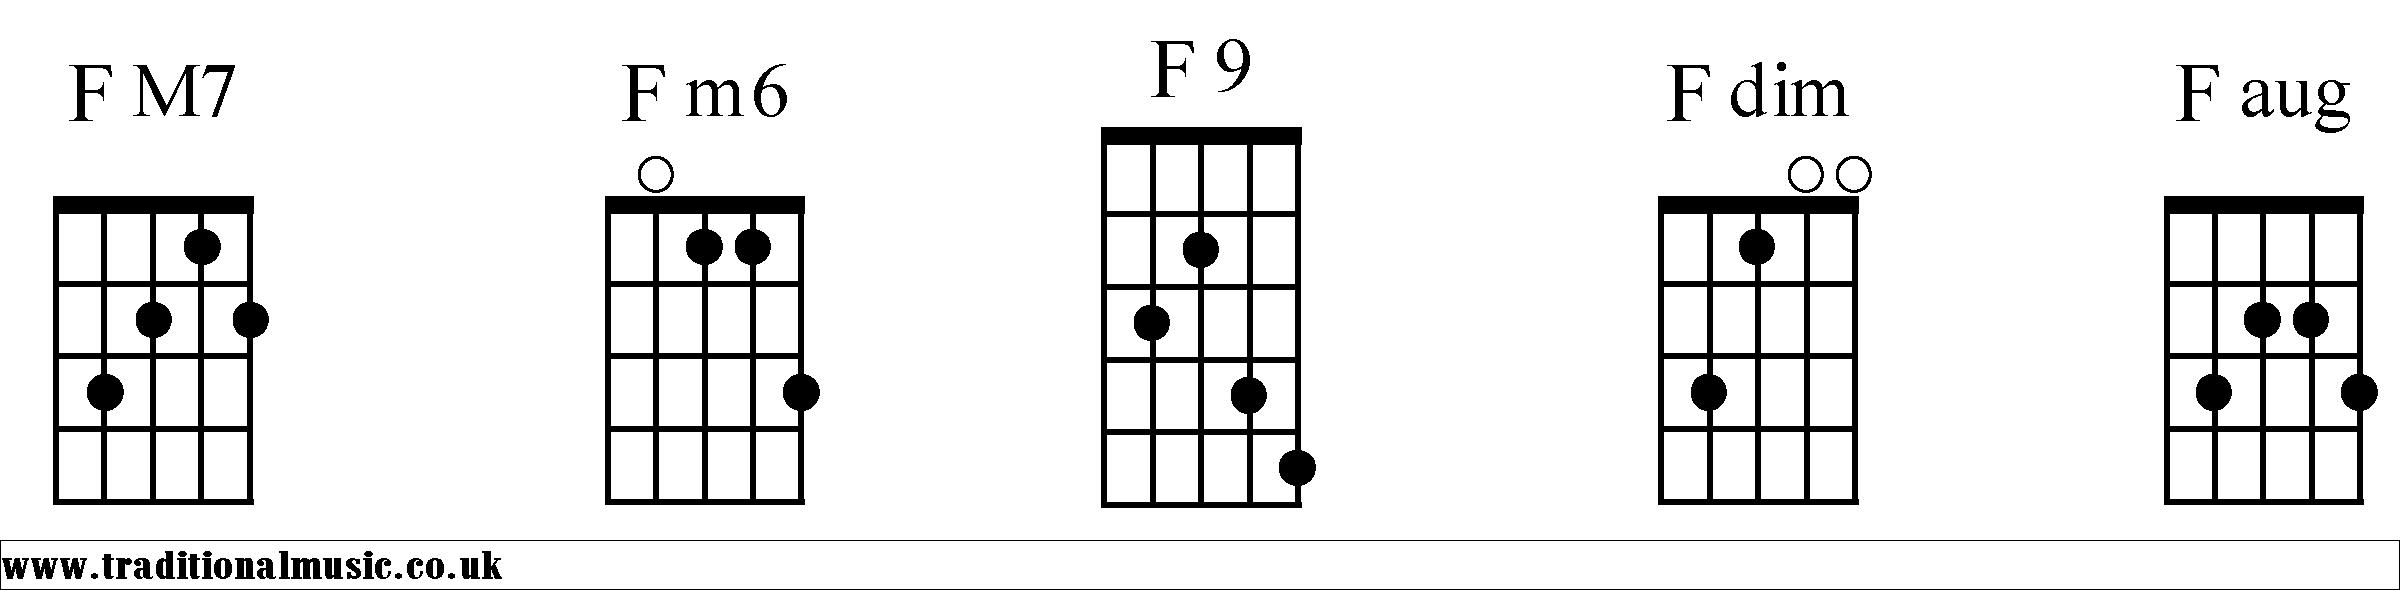 Fmaj7th Guitar Chord Image Collections Basic Guitar Chords Finger